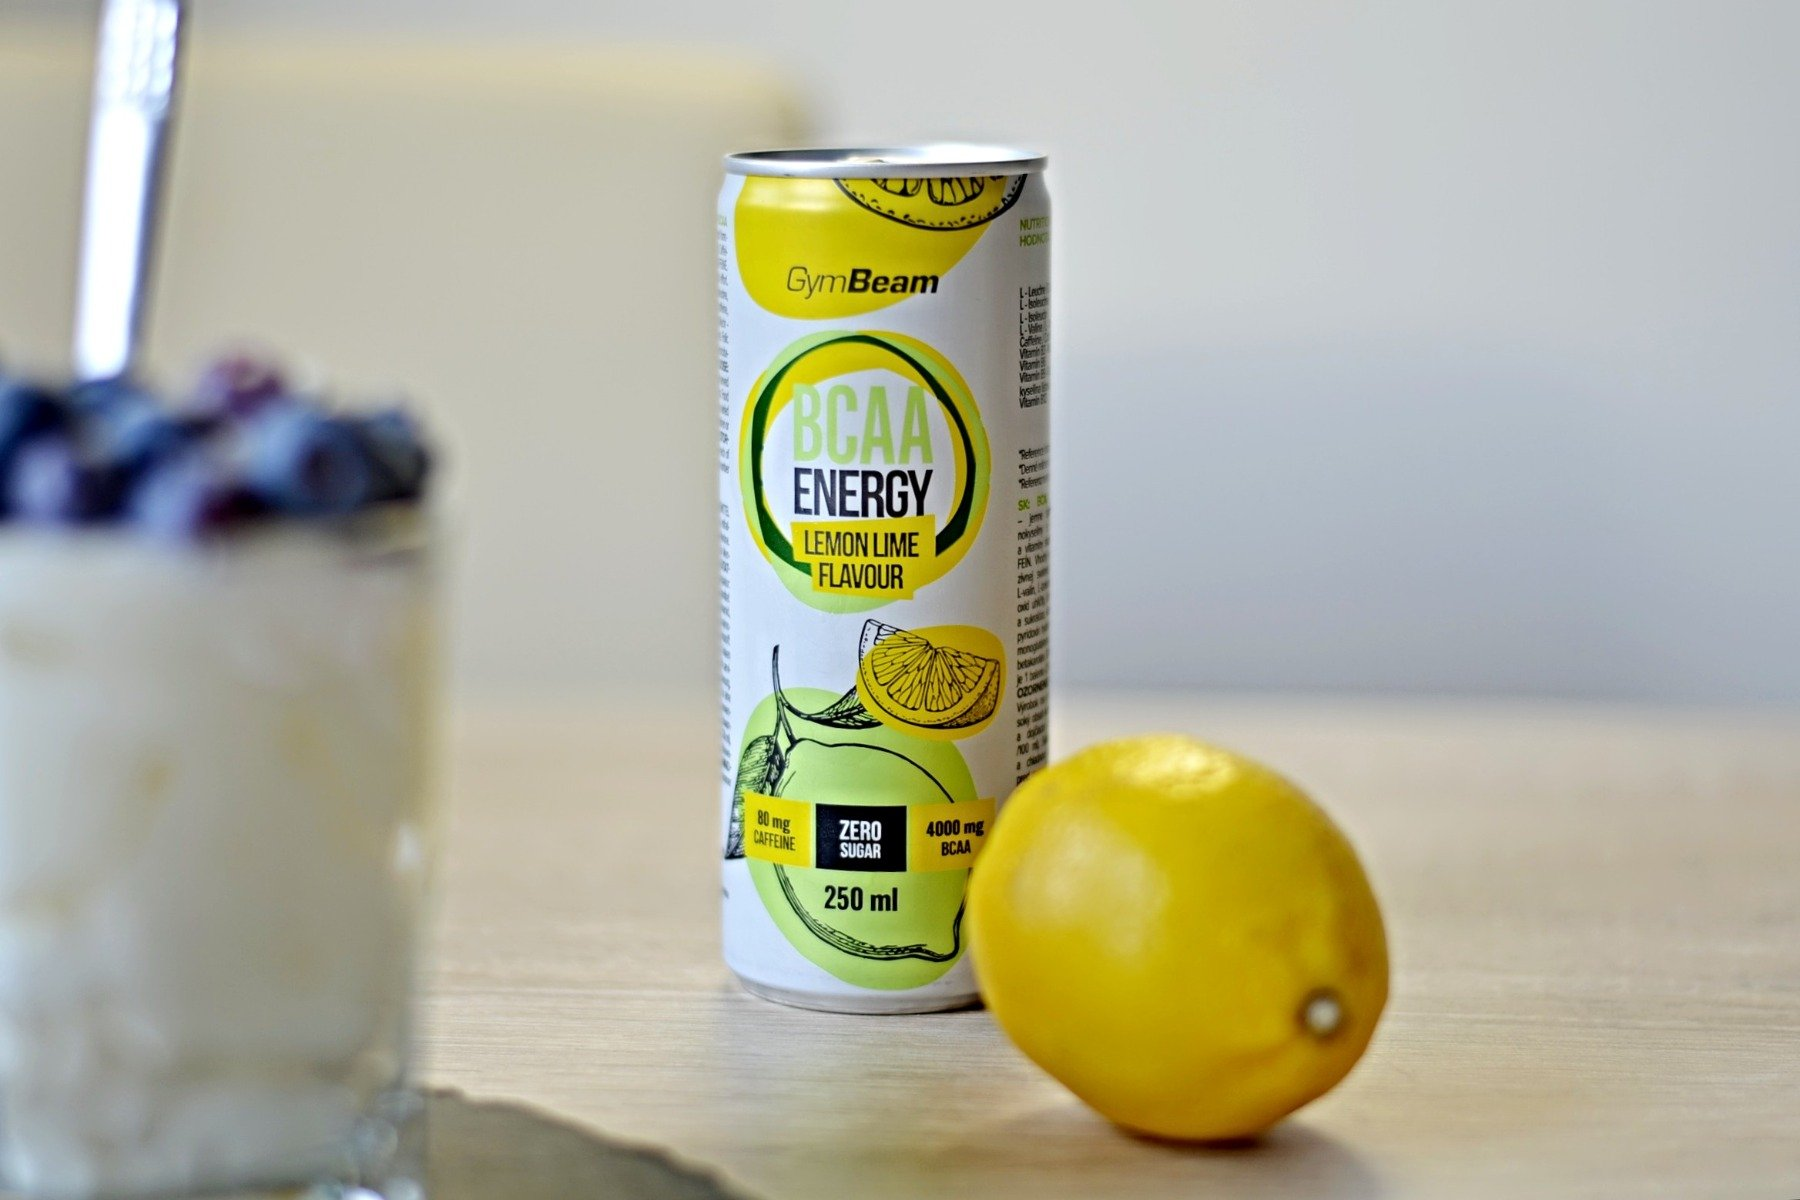 BCAA Energy drink v plechovce GymBeam